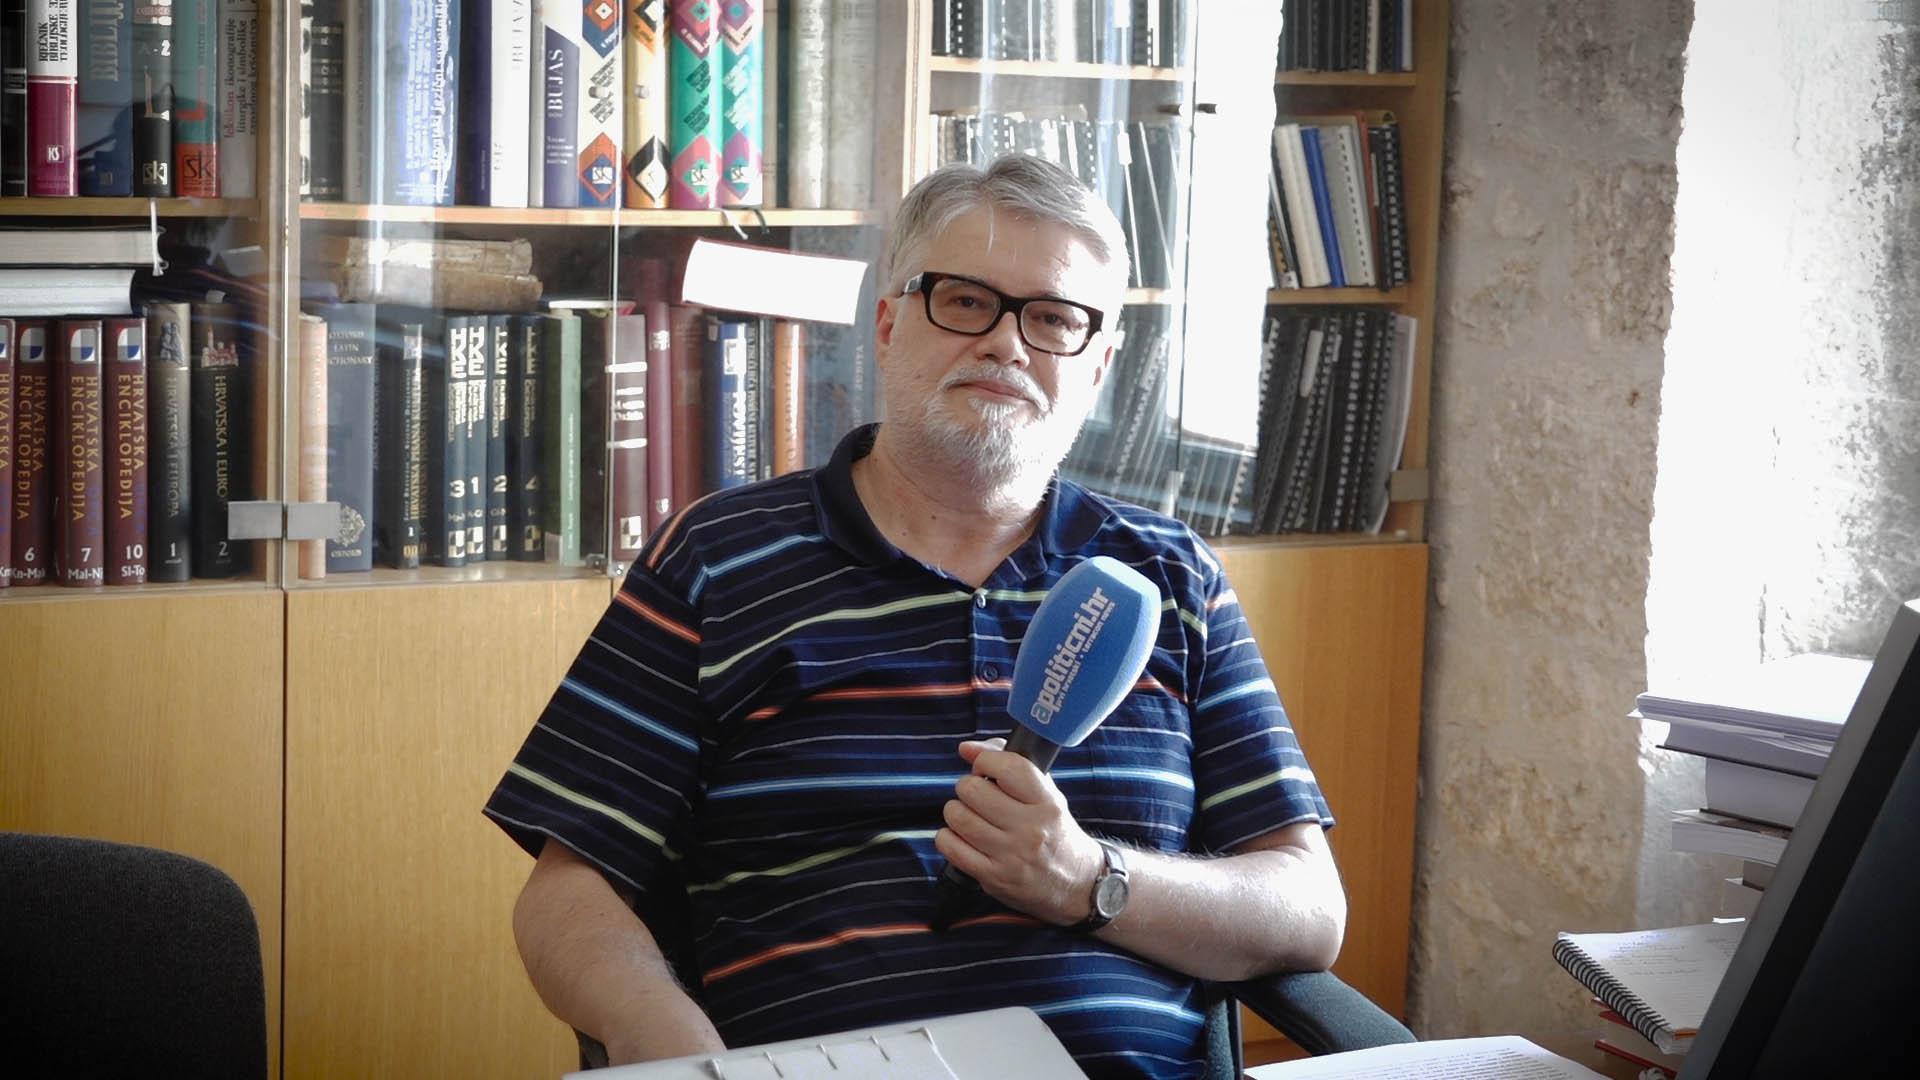 Književni krug Split - Marulianum